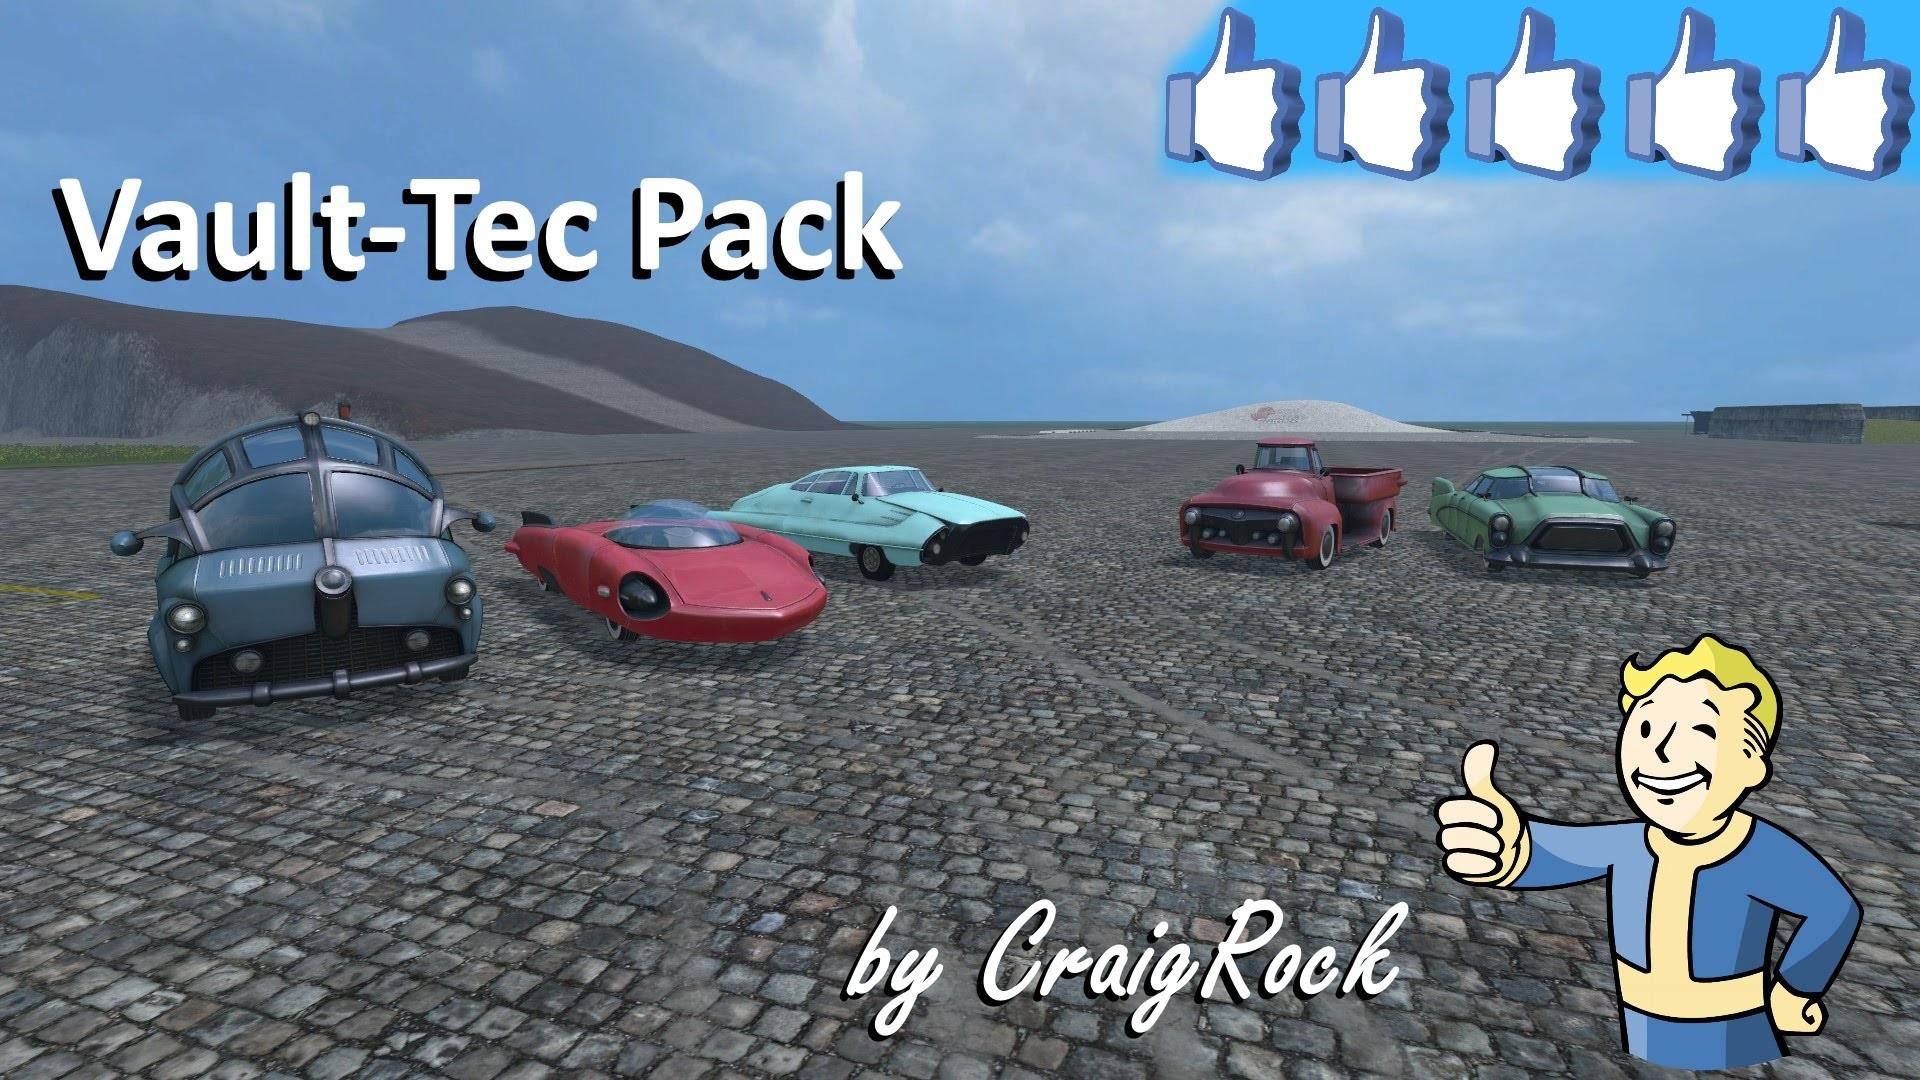 Review Vault-Tec Pack #FS15